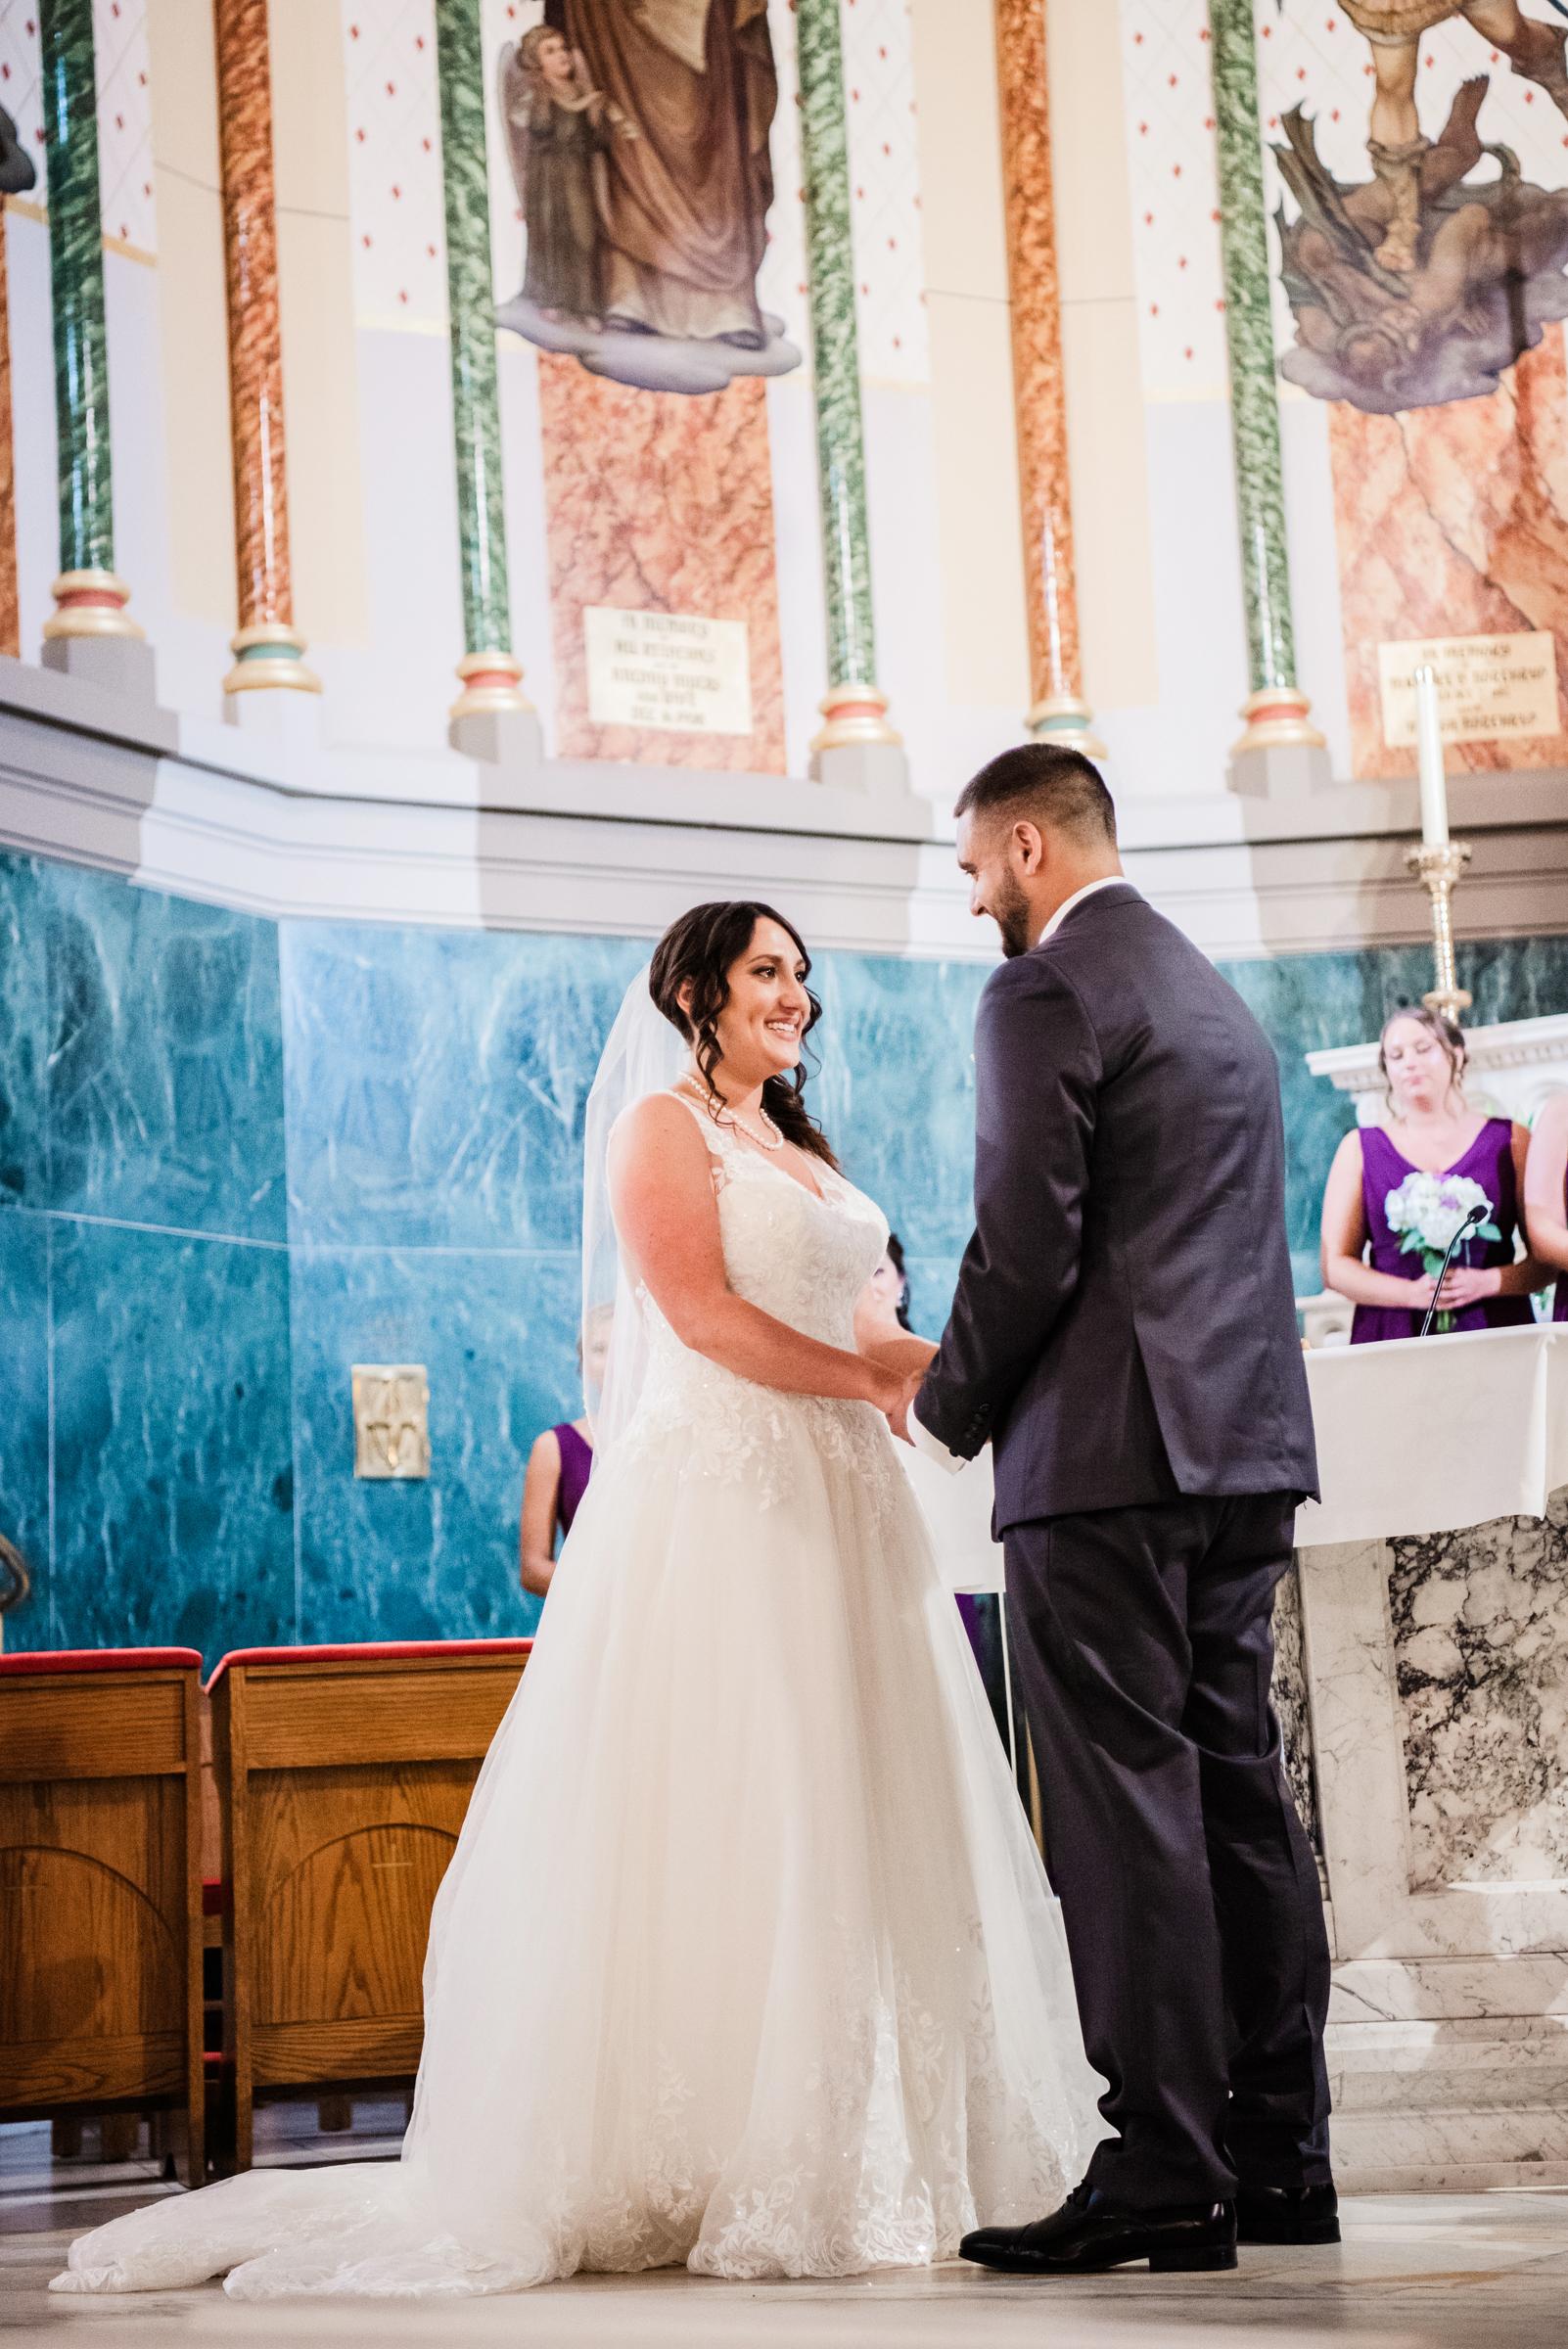 Historic_Old_St_Johns_Church_Valentinos_Banquet_Hall_Central_NY_Wedding_JILL_STUDIO_Rochester_NY_Photographer_DSC_5775.jpg